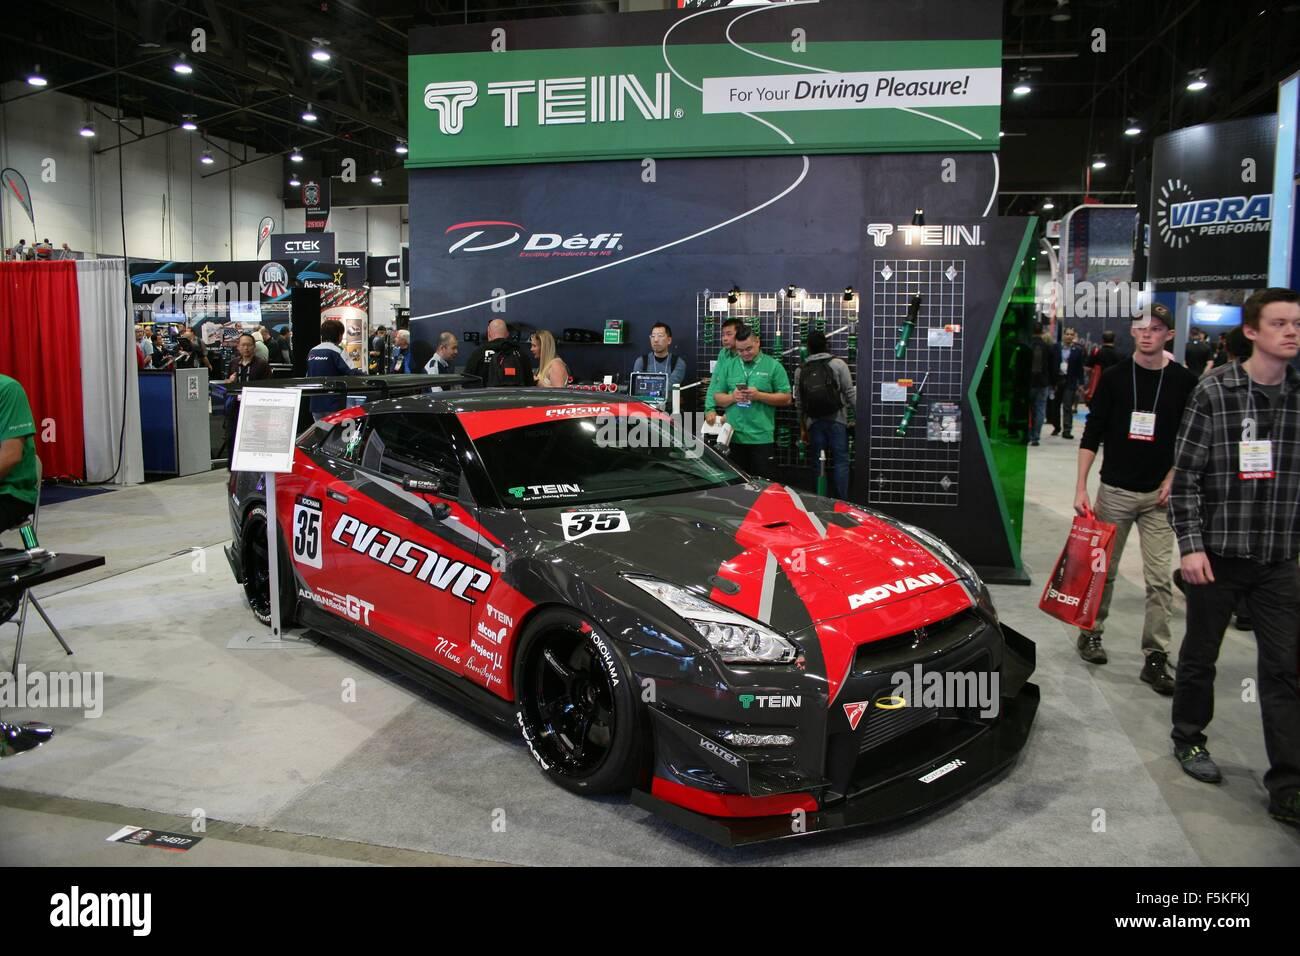 Las Vegas, NV, USA. 5th Nov, 2015. Custom 2010 Nissan GT-R by Evasive Motorsports in attendance for The 2015 SEMA - Stock Image